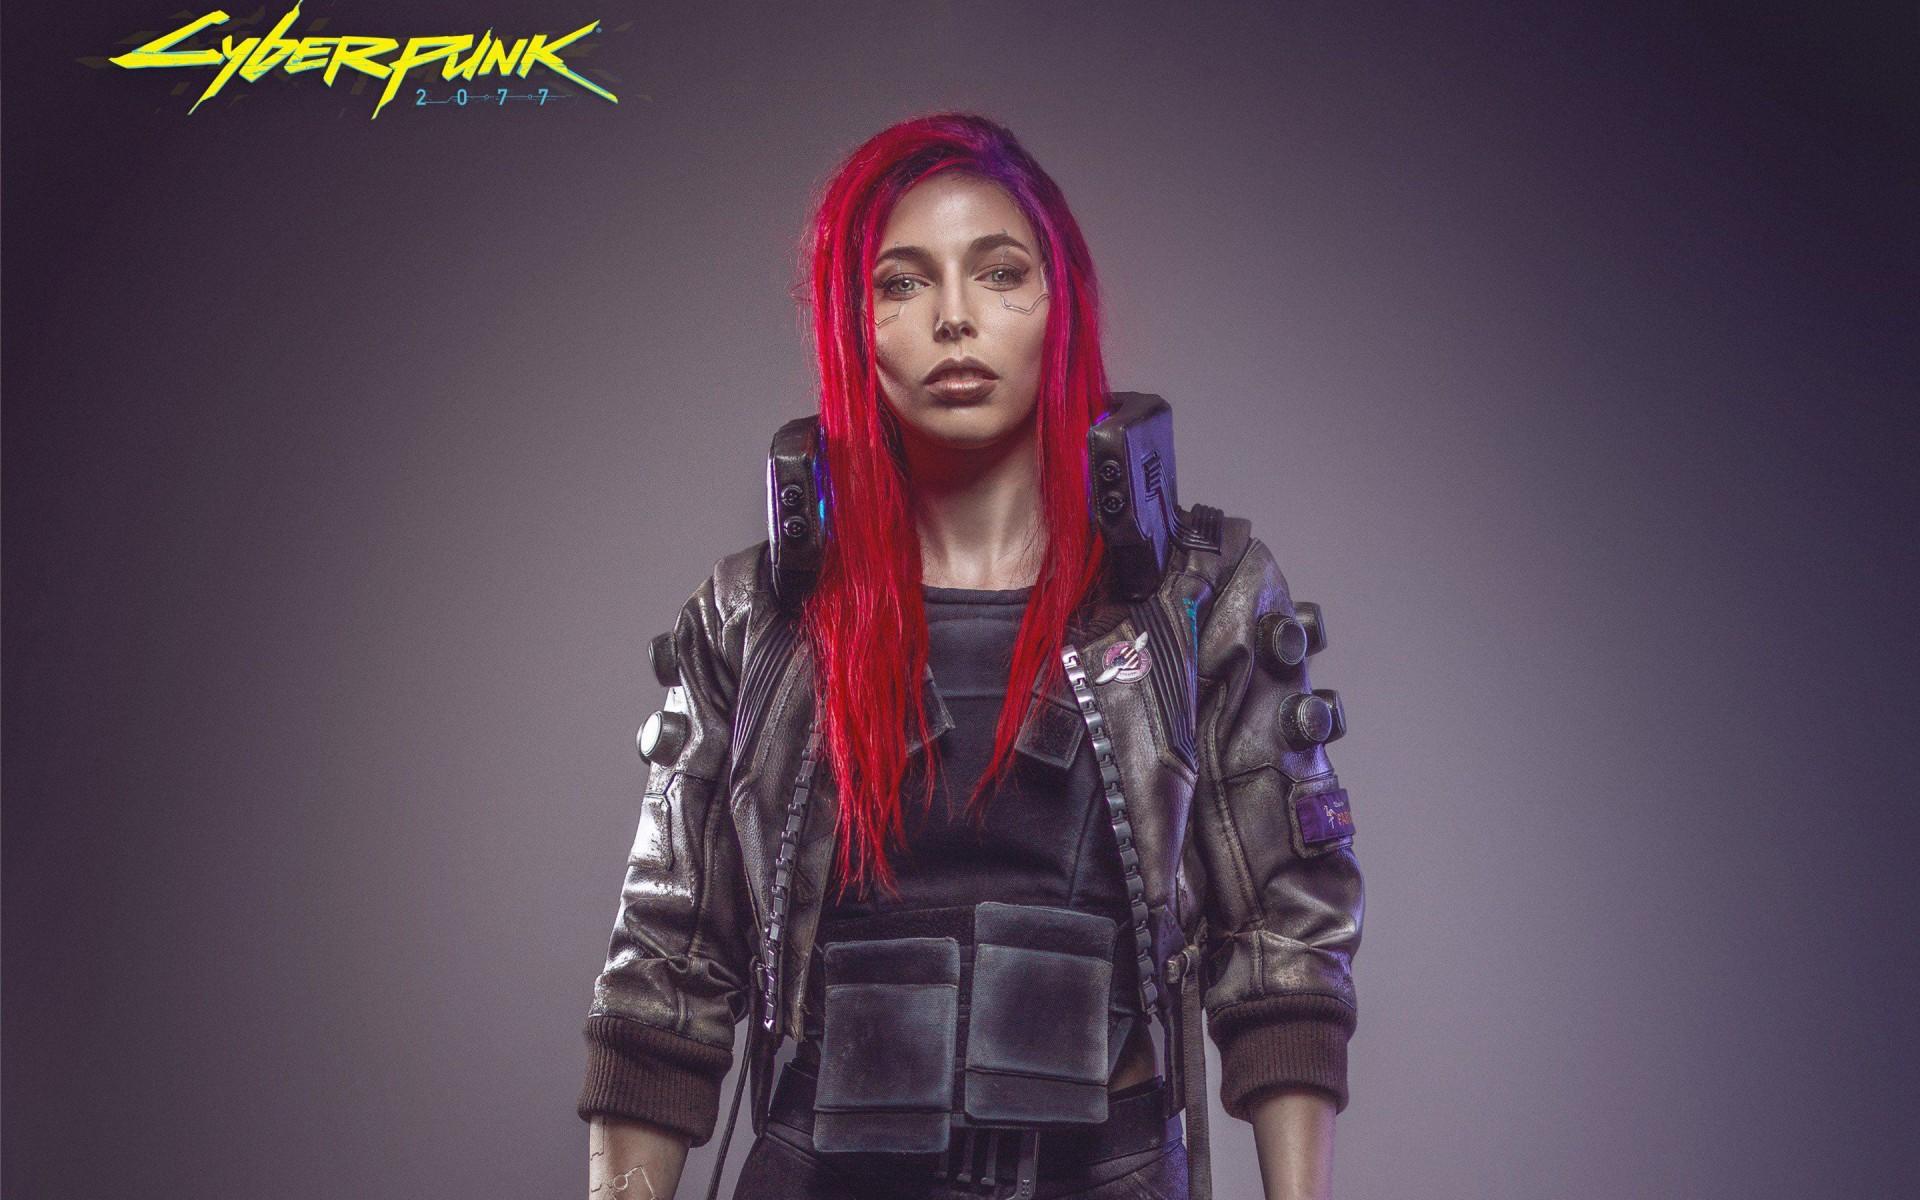 Cyber Girl Wallpaper Cyberpunk 2077 Female Cosplay Wallpapers Hd Wallpapers